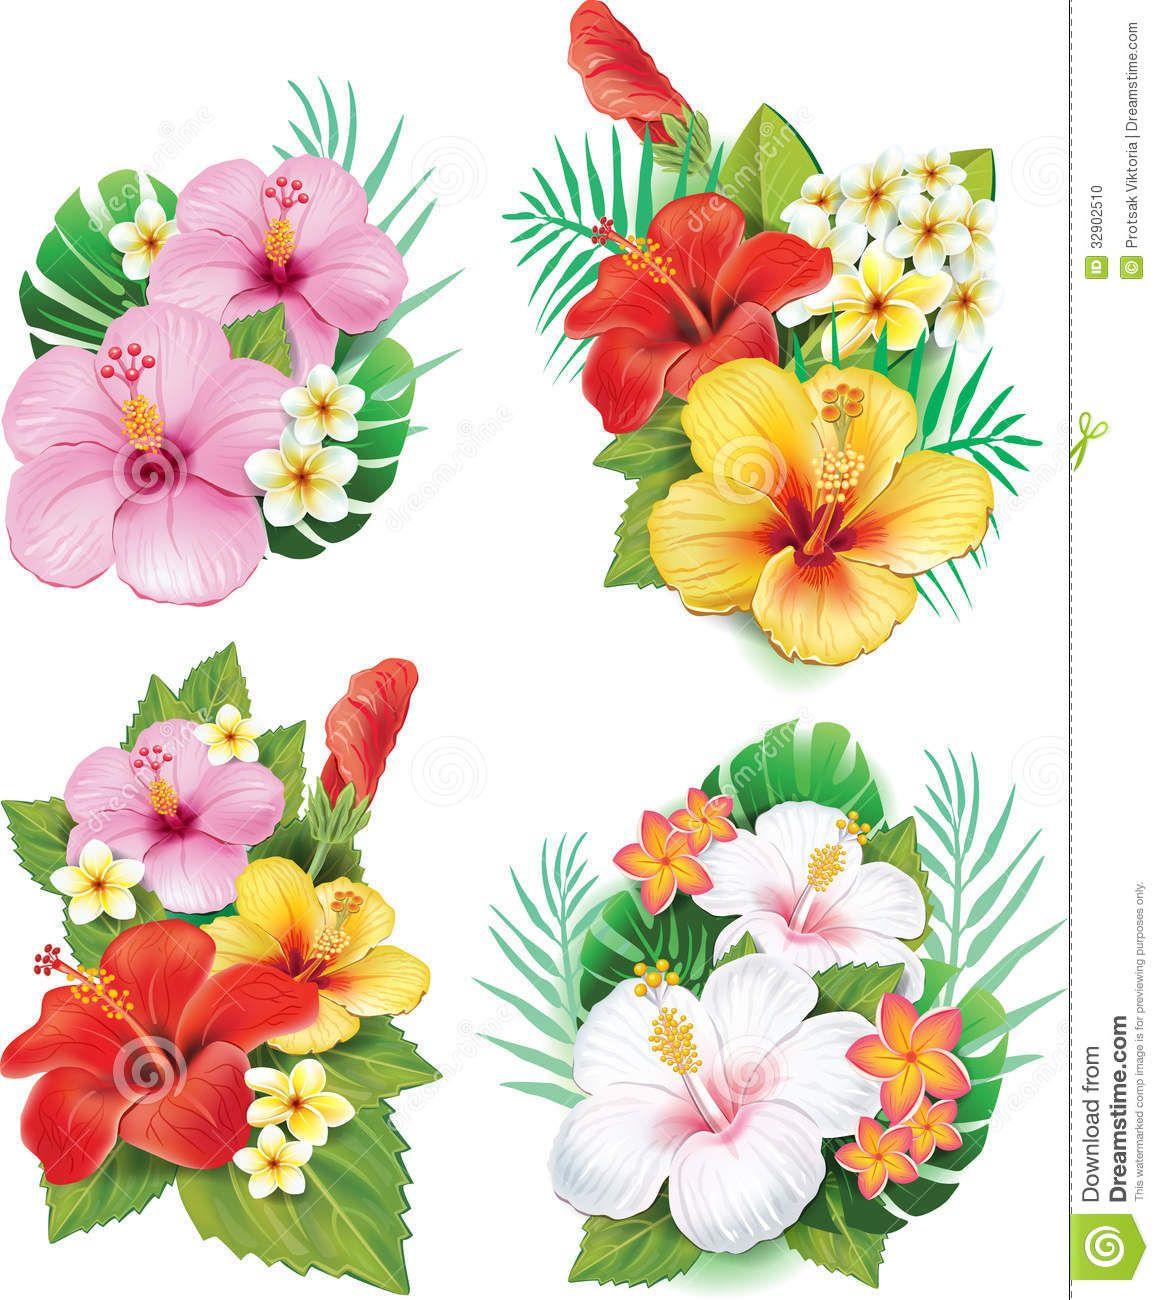 Blue Hawaiian Flower Clipart Arrangement From Hibiscus Other